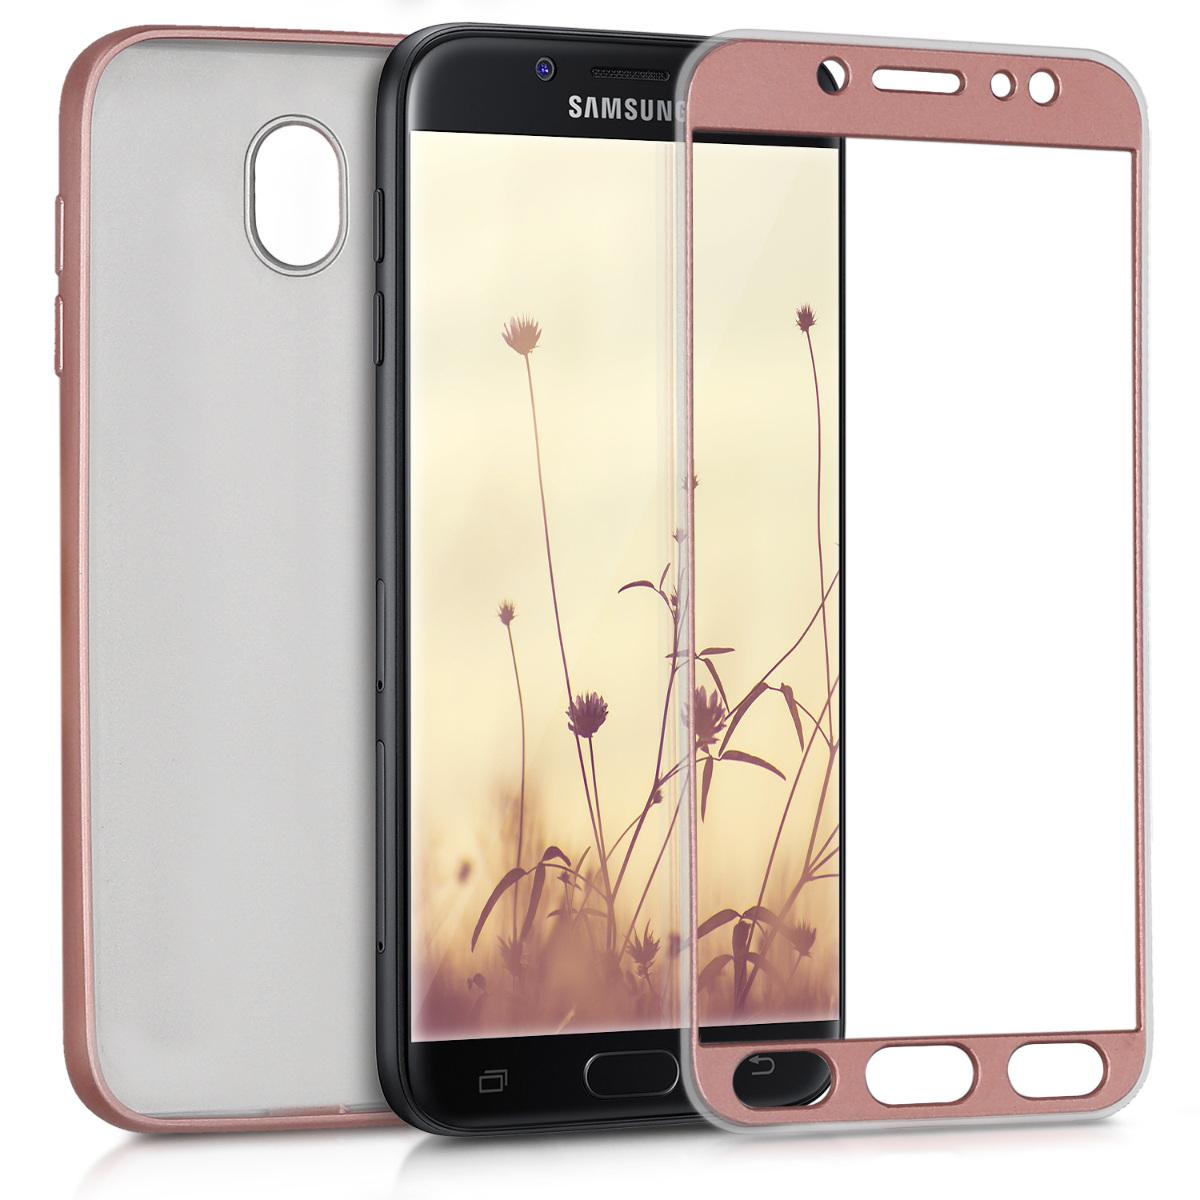 KW Θήκη Σιλικόνης Full Body Samsung Galaxy J7 (2017) DUOS - Metallic Rose Gold (42758.31)